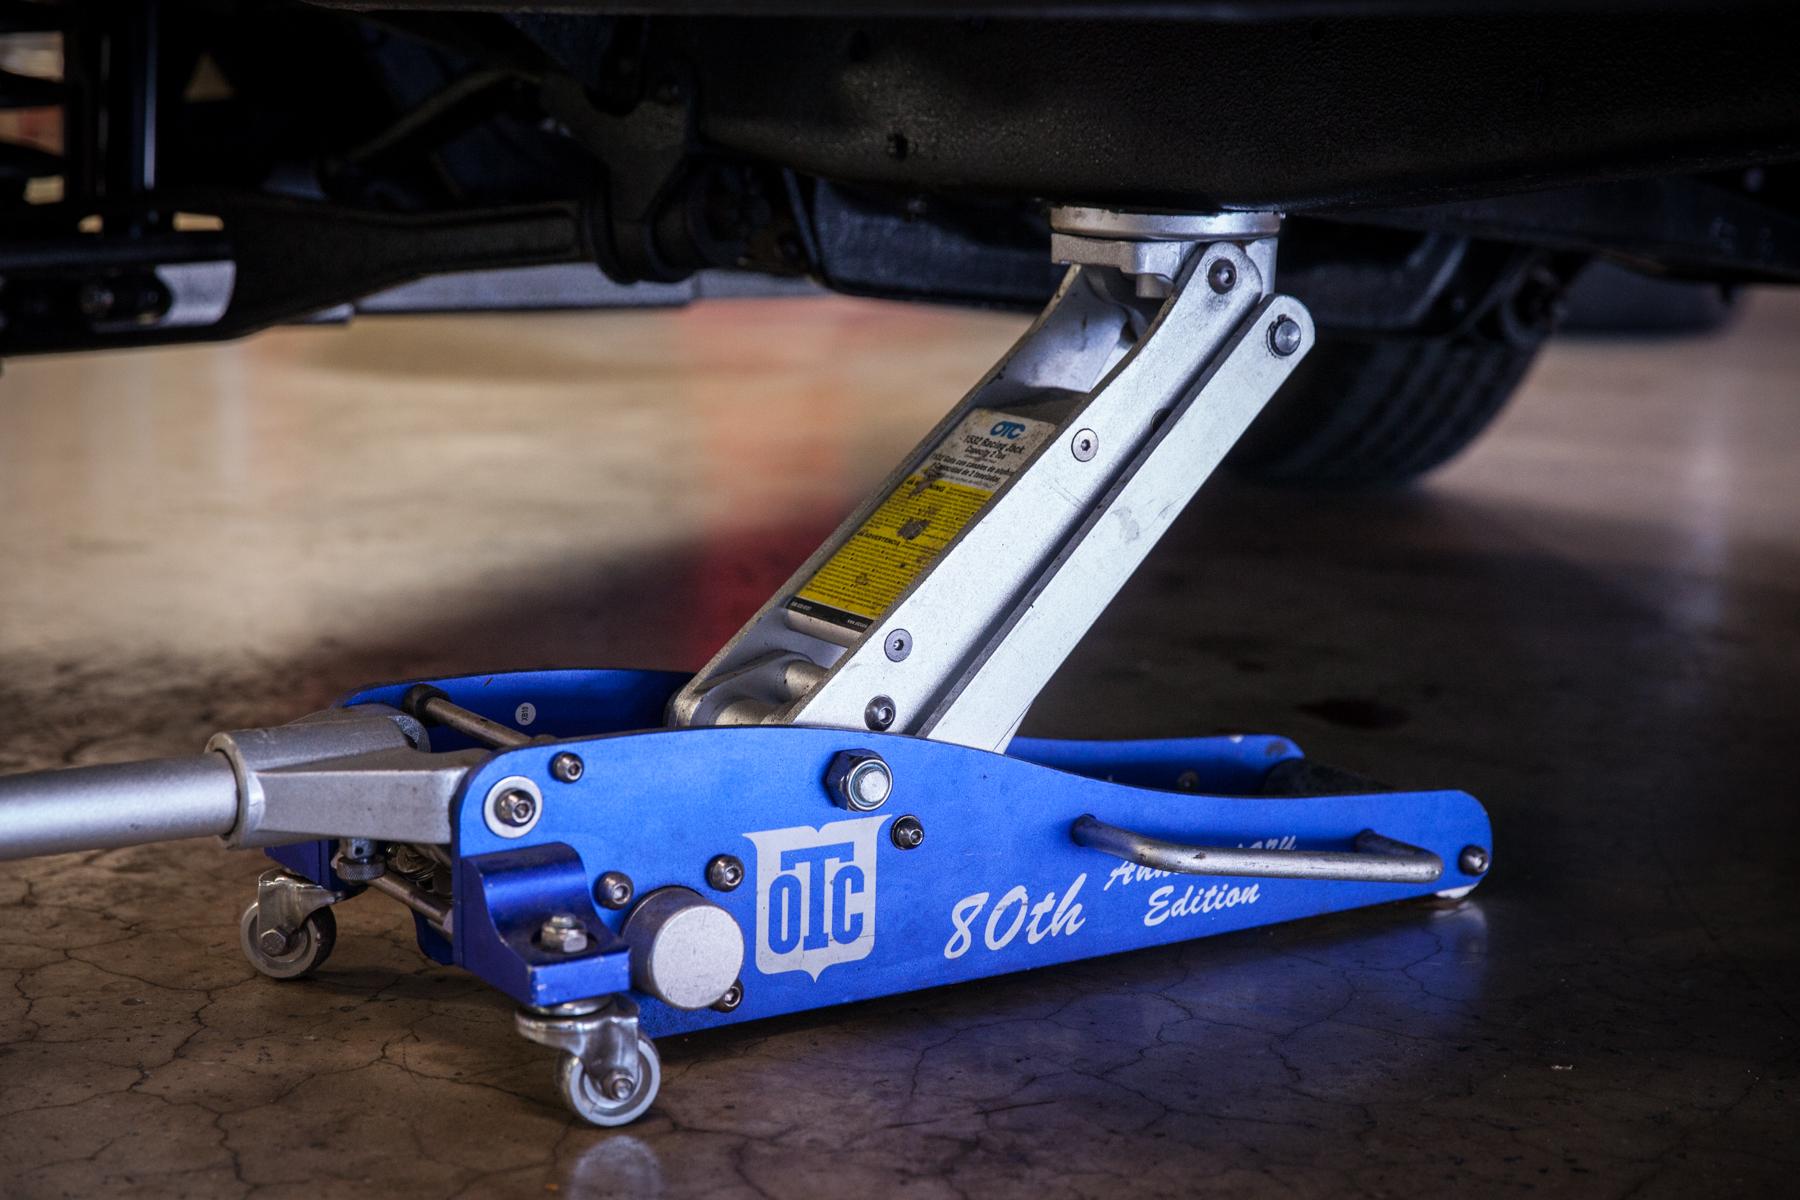 Otc Motorcycle Lift : Otc floor jacks matttroy